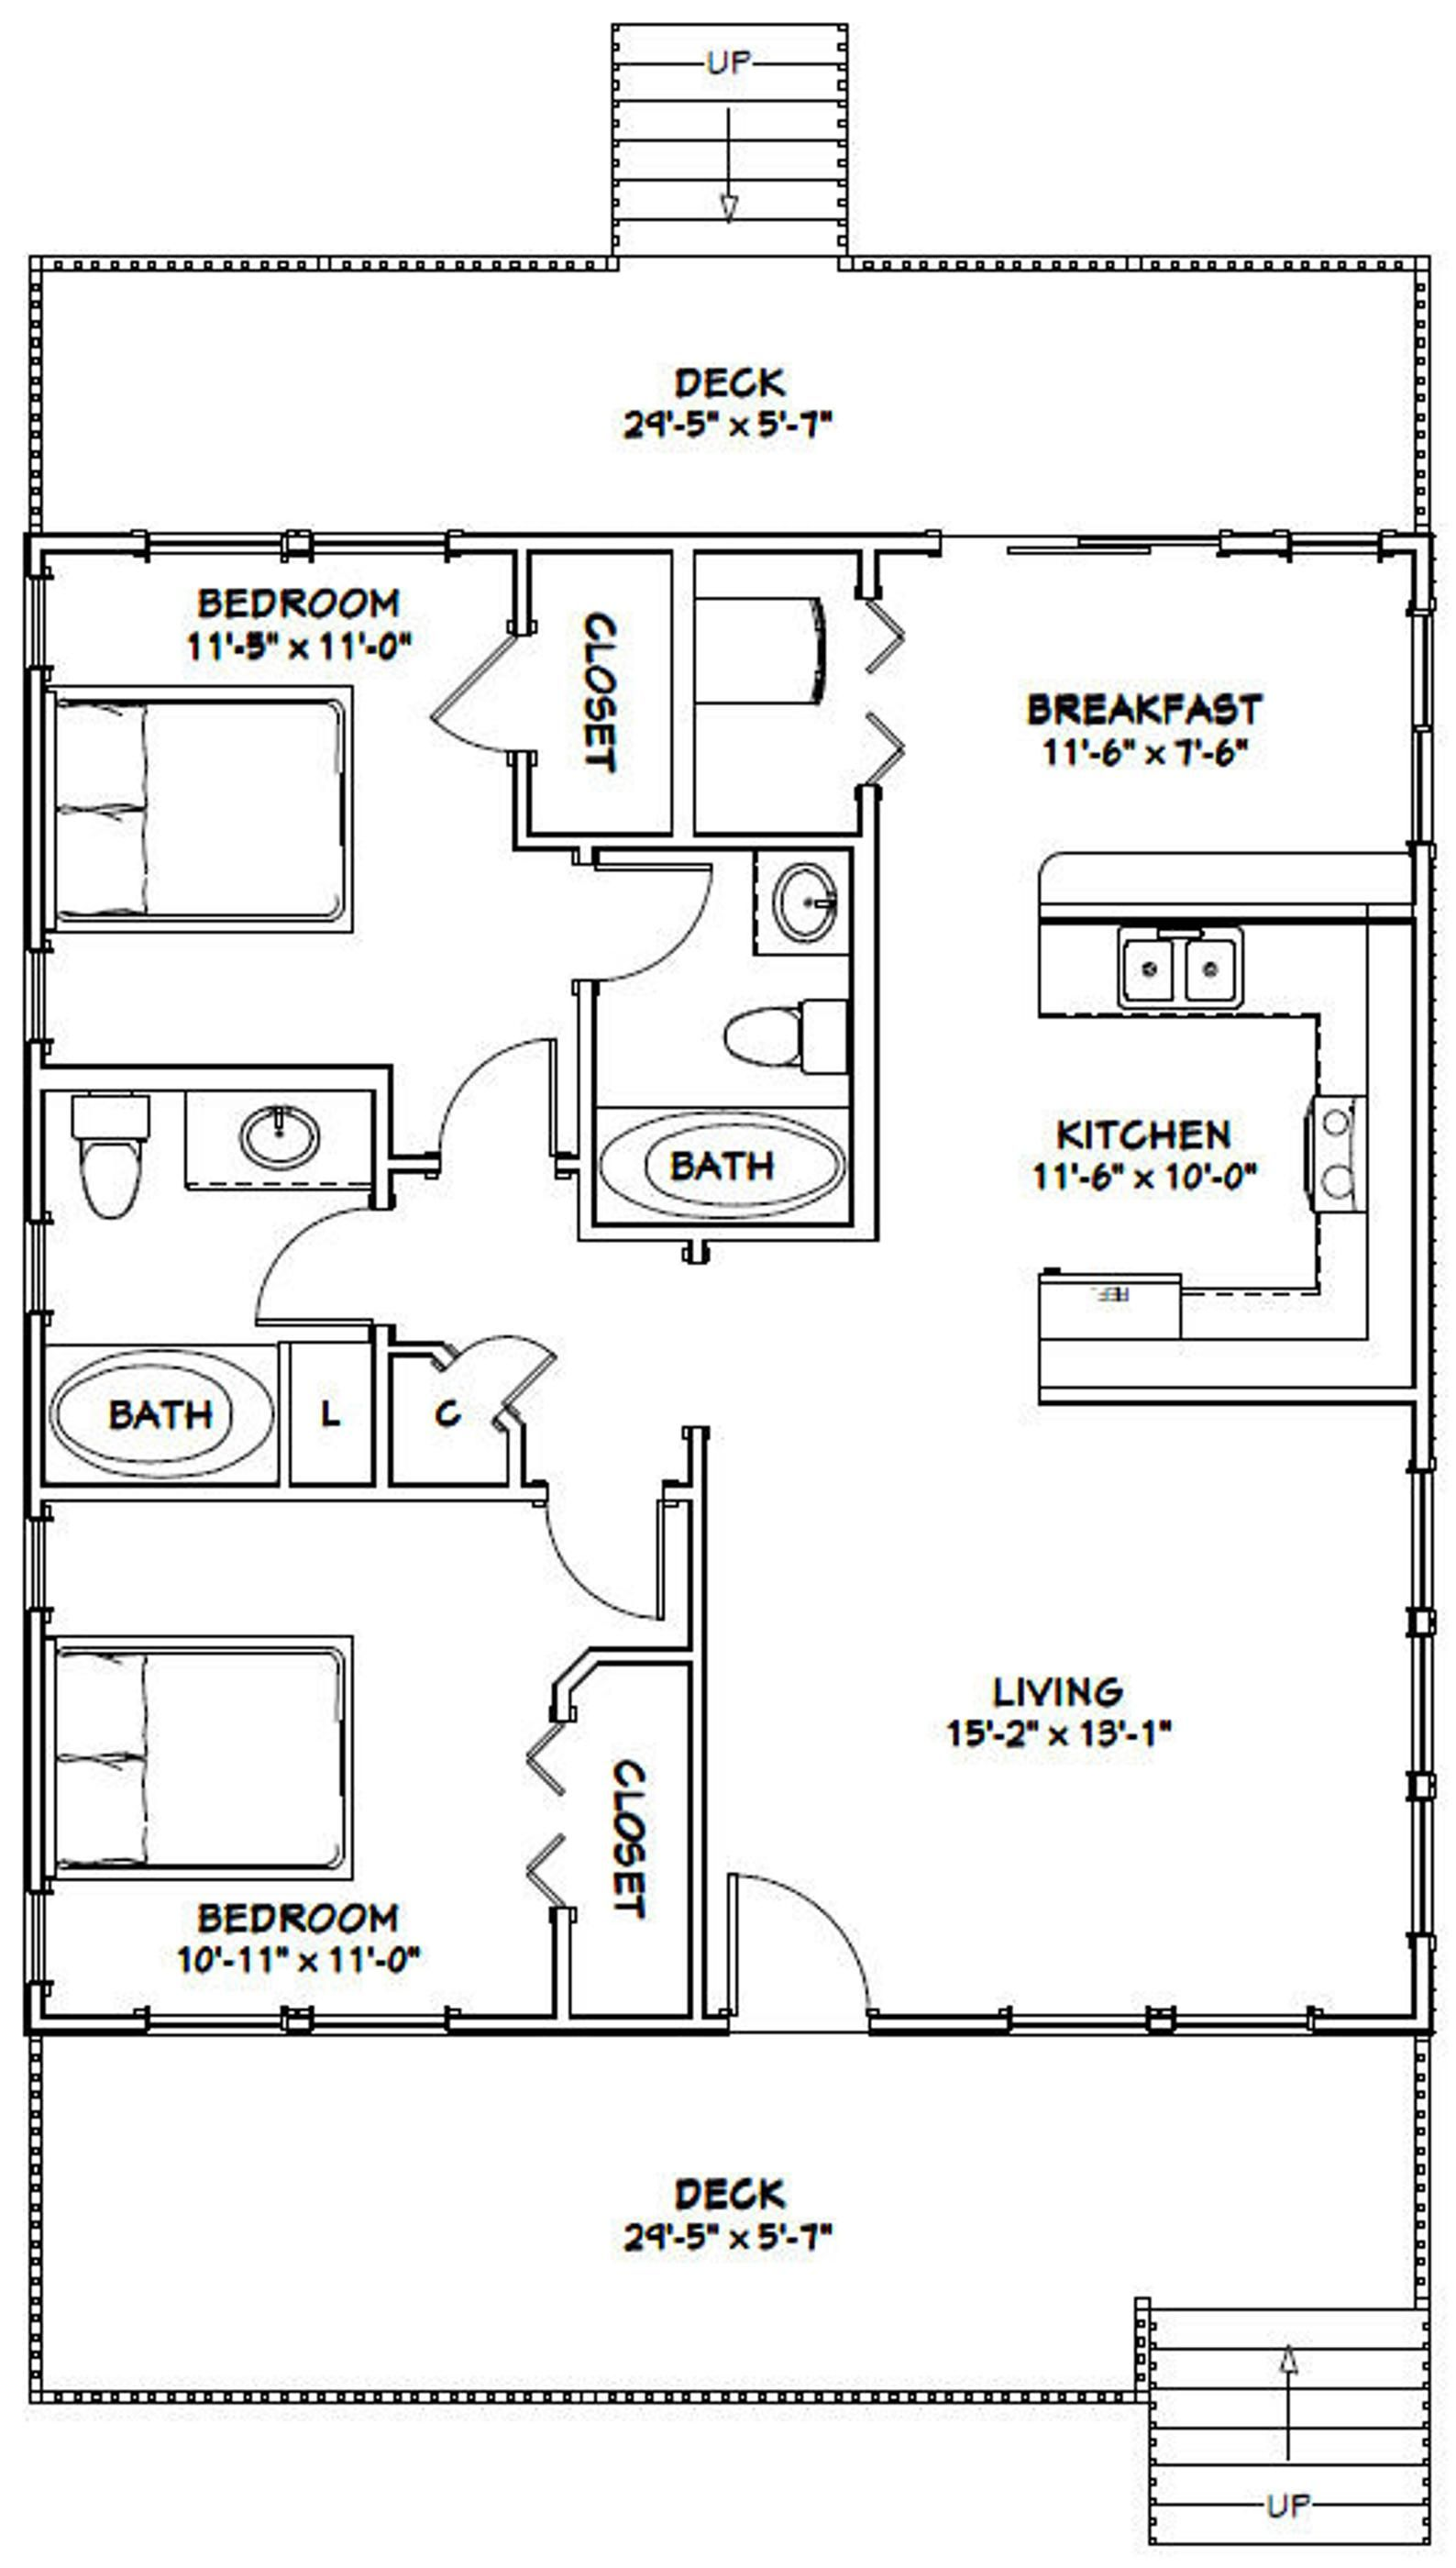 30x32 House 2 Bedroom 2 Bath 960 Sq Ft Pdf Floor Plan Instant Download Model 4 Tiny House Floor Plans Small House Floor Plans 1200 Sq Ft House